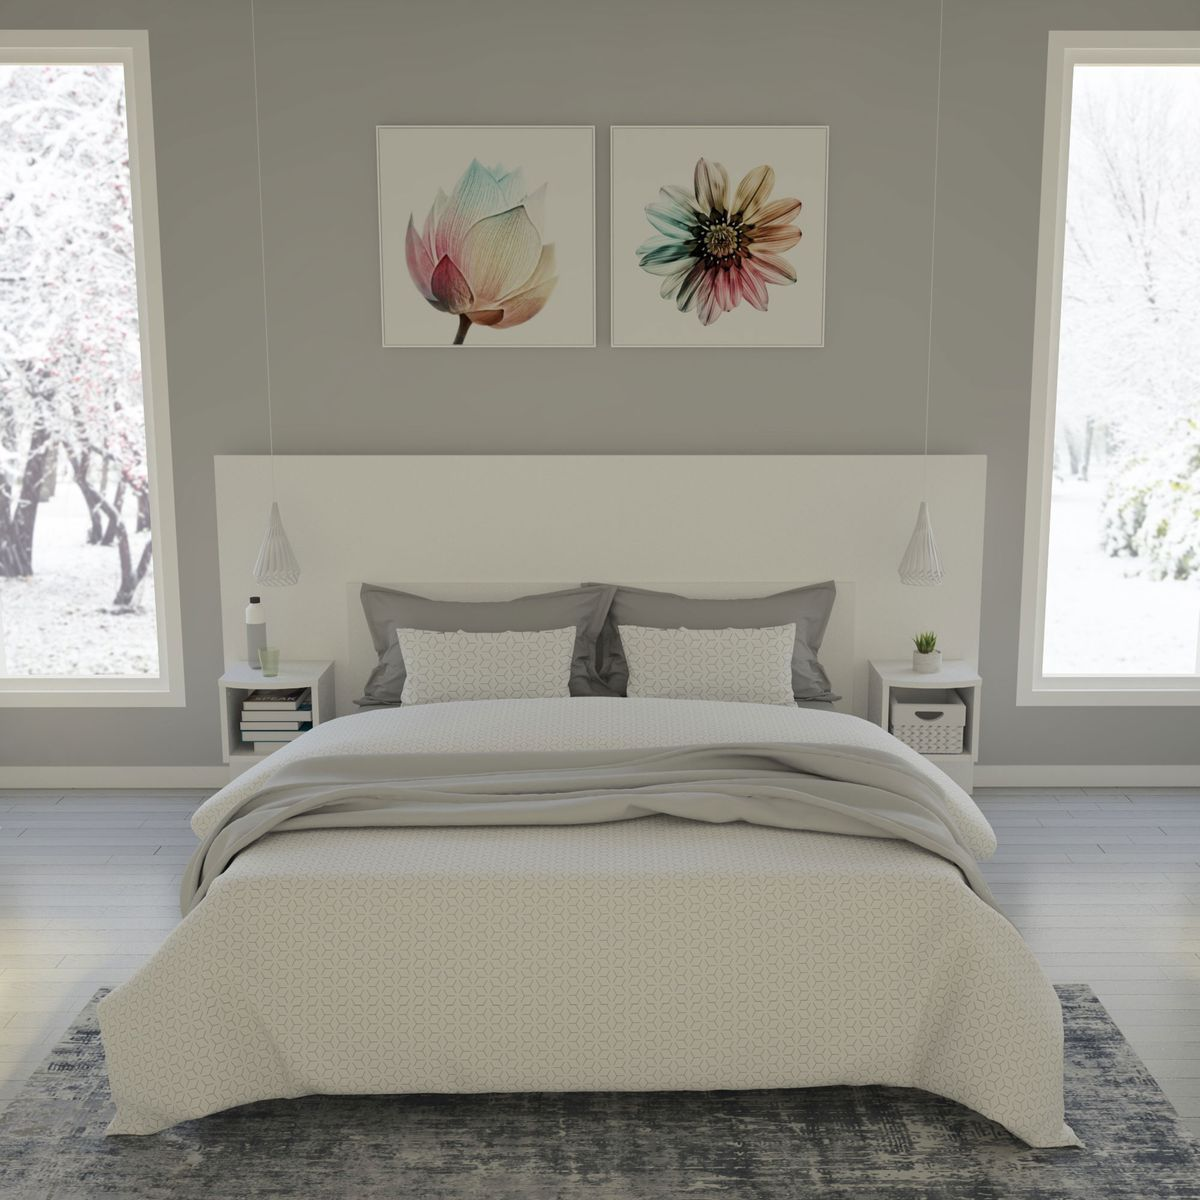 Tete De Lit Avec Chevet Incorpore Tres Large Recherche Google Bedroom Furniture Double Bed Designs Bedroom Interior